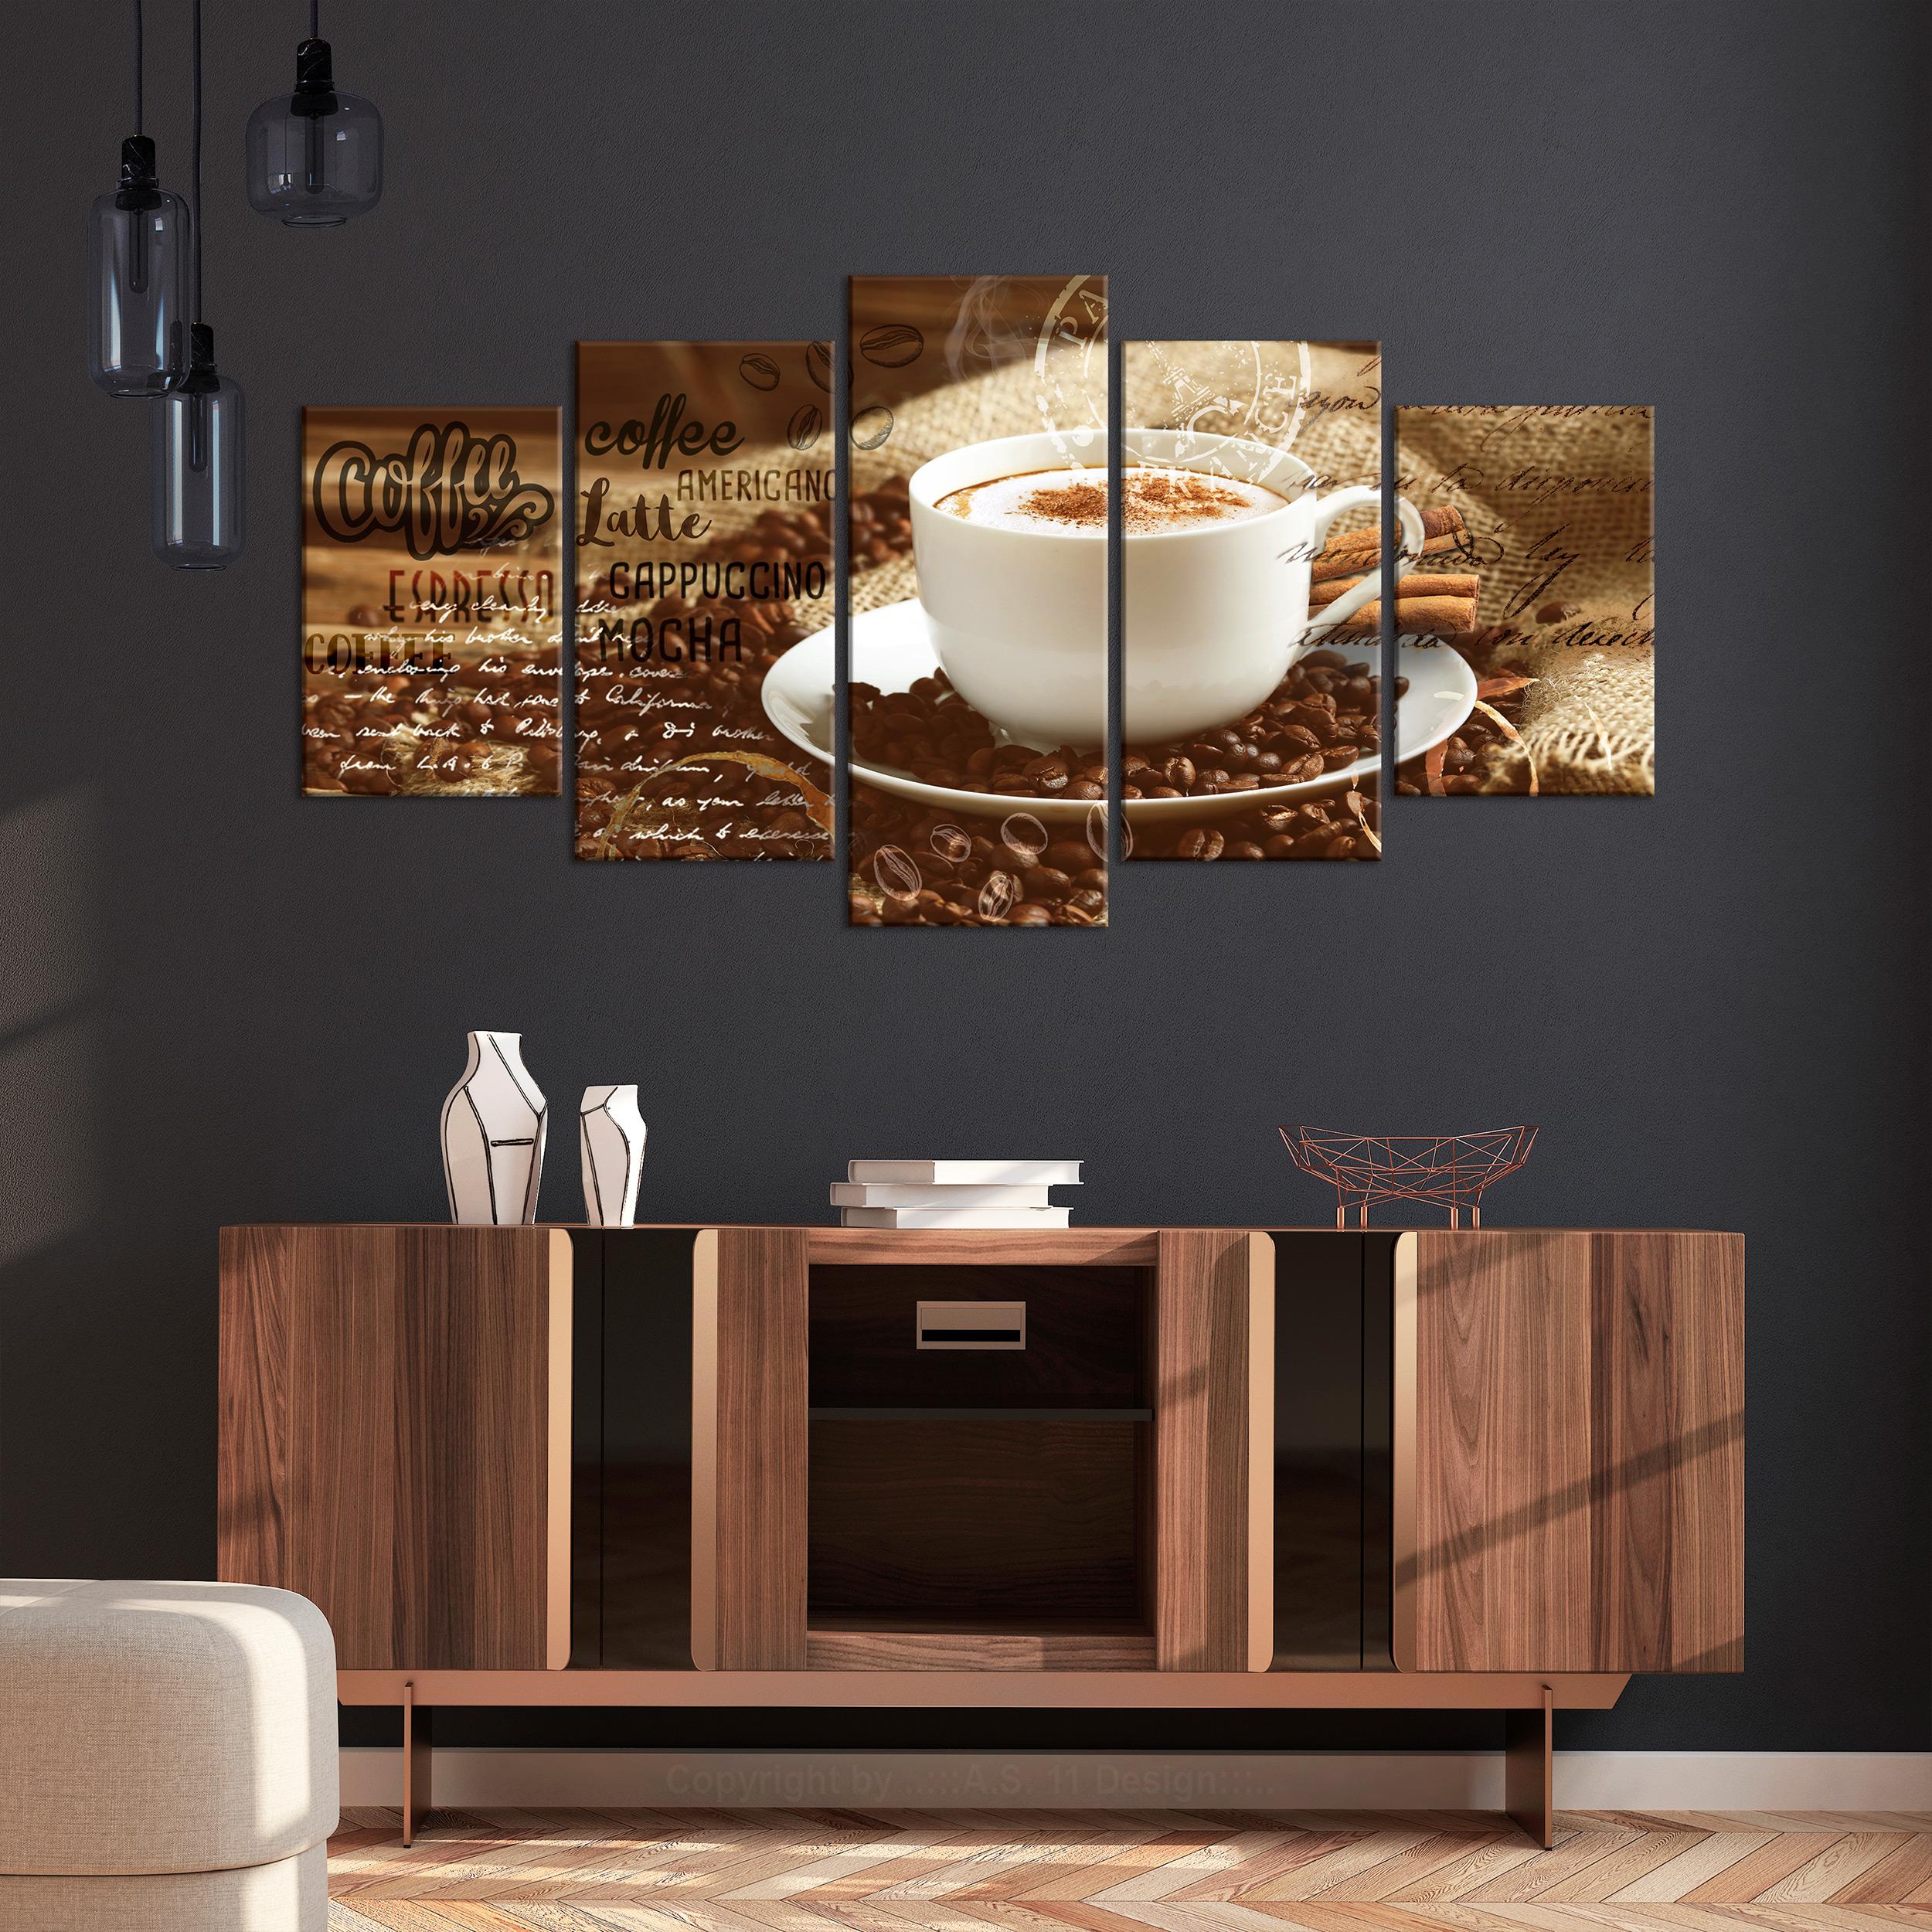 kaffee leinwand deko bild xxl coffee küche wand bilder